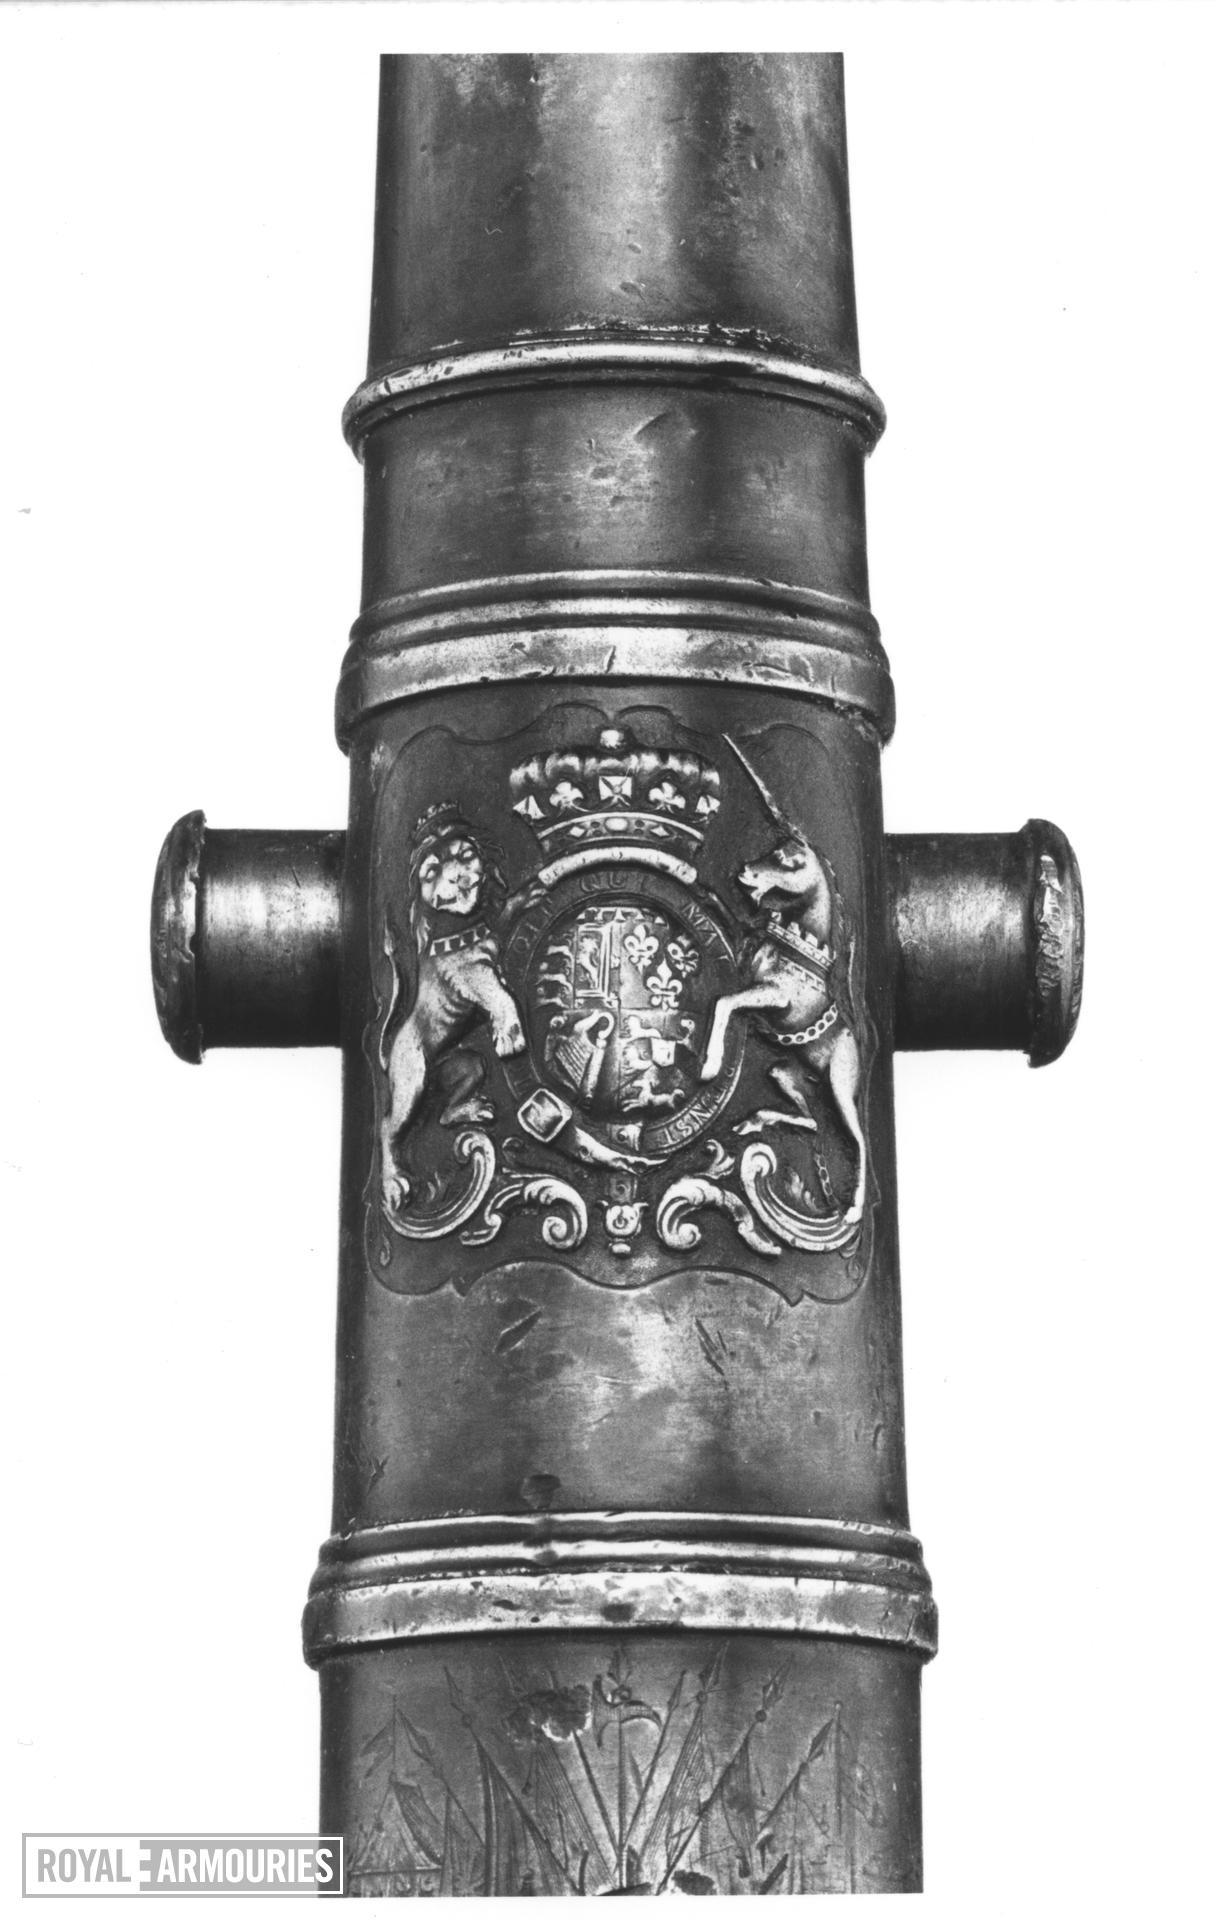 Miniature bronze gun - By W. Shepherd